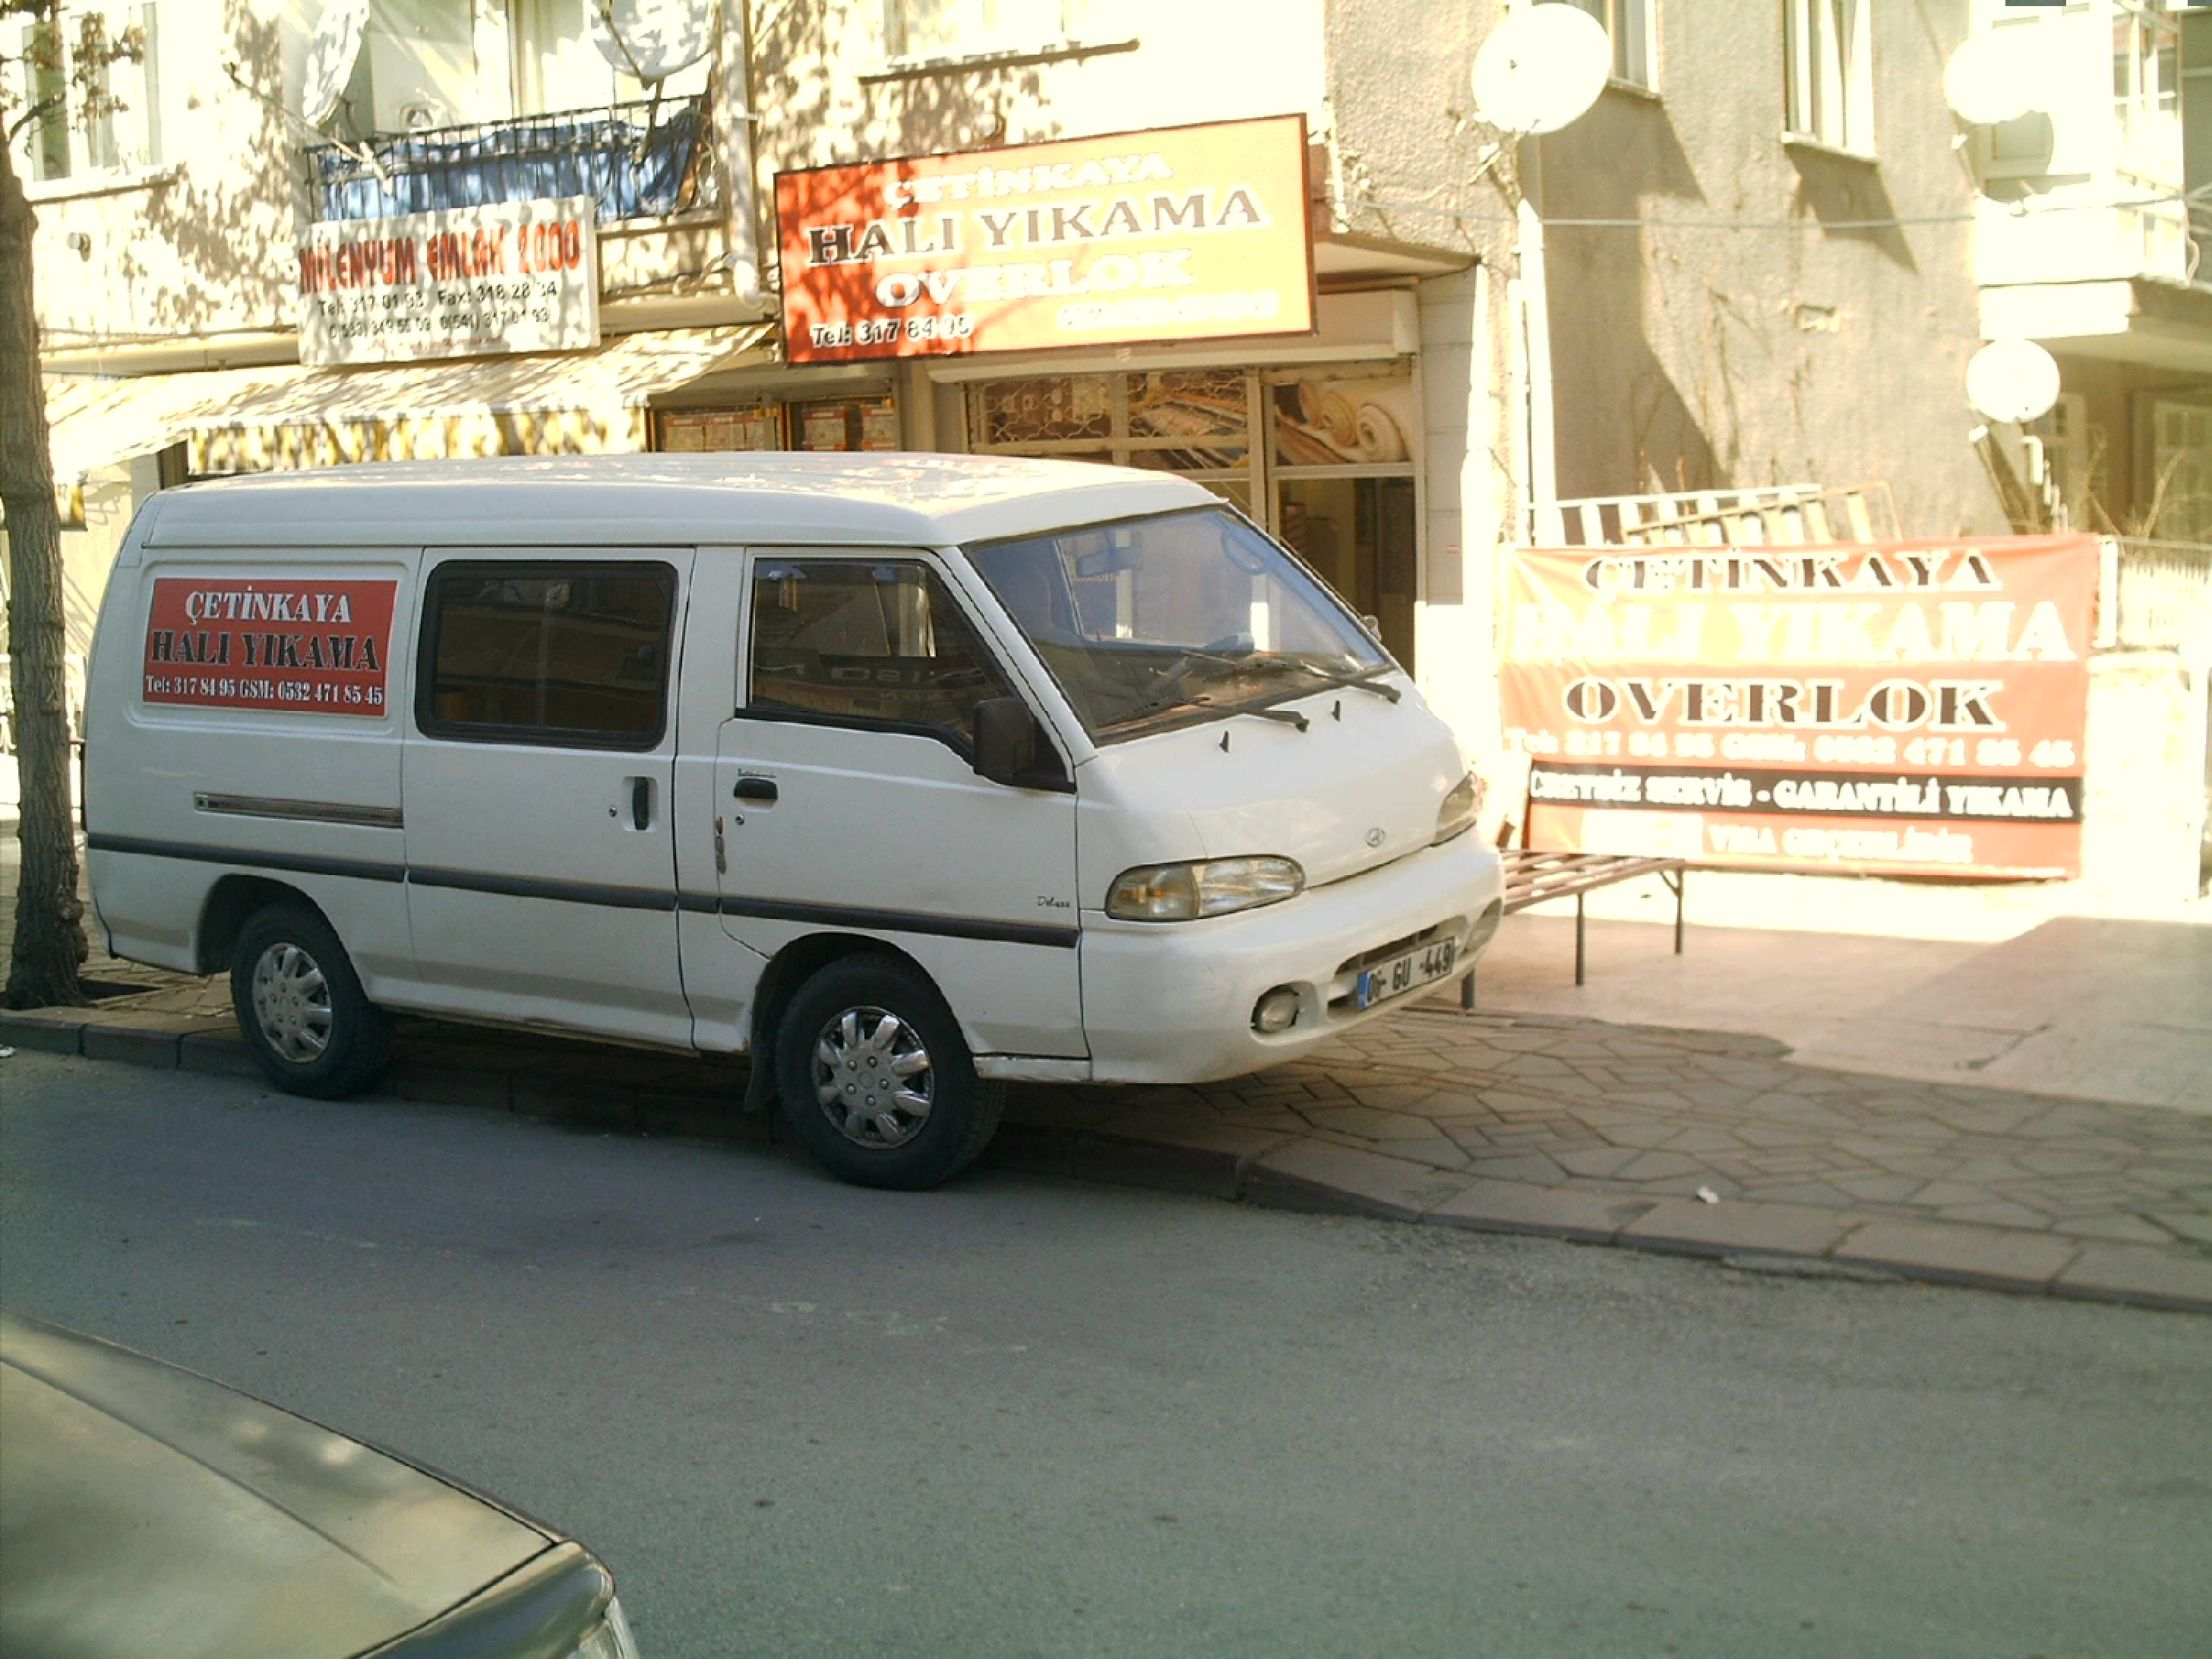 şeker_hali_yikama_servis-1 (3)